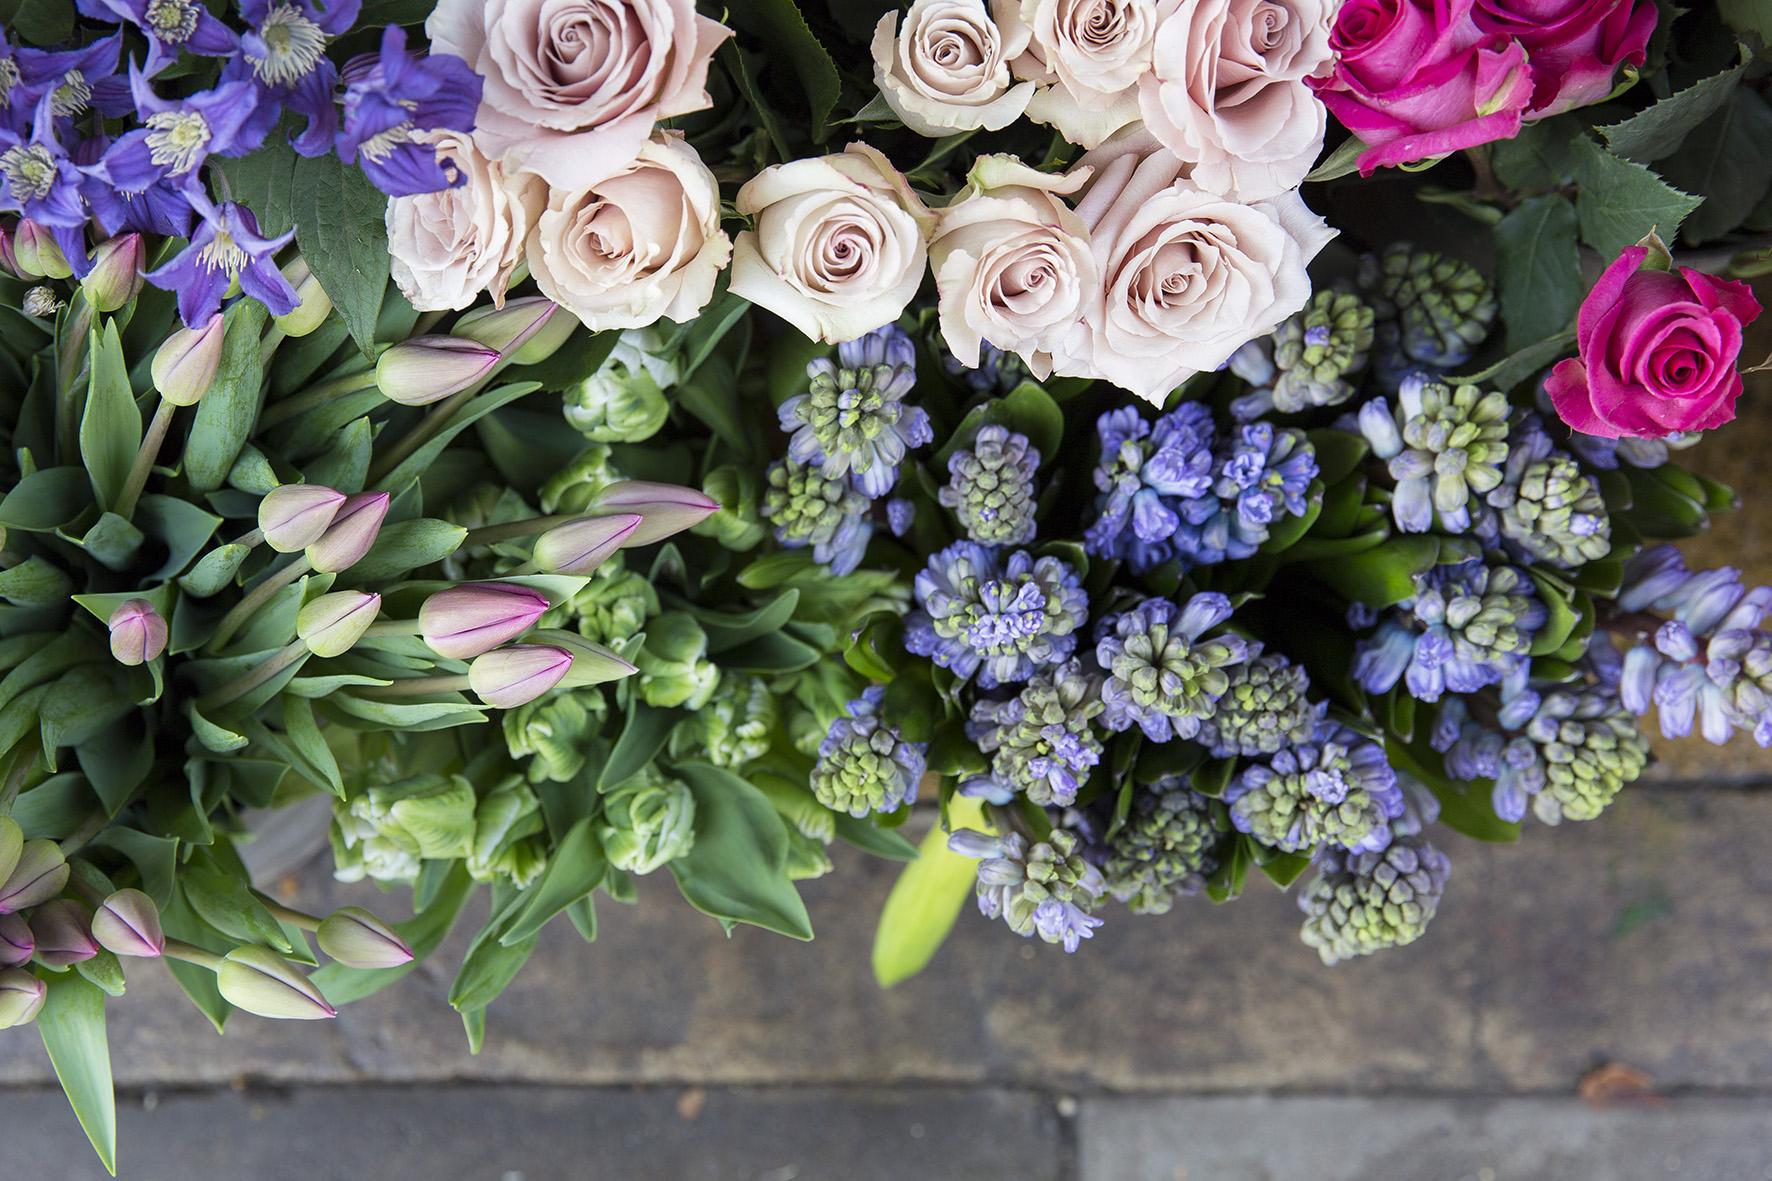 The Flower Yard